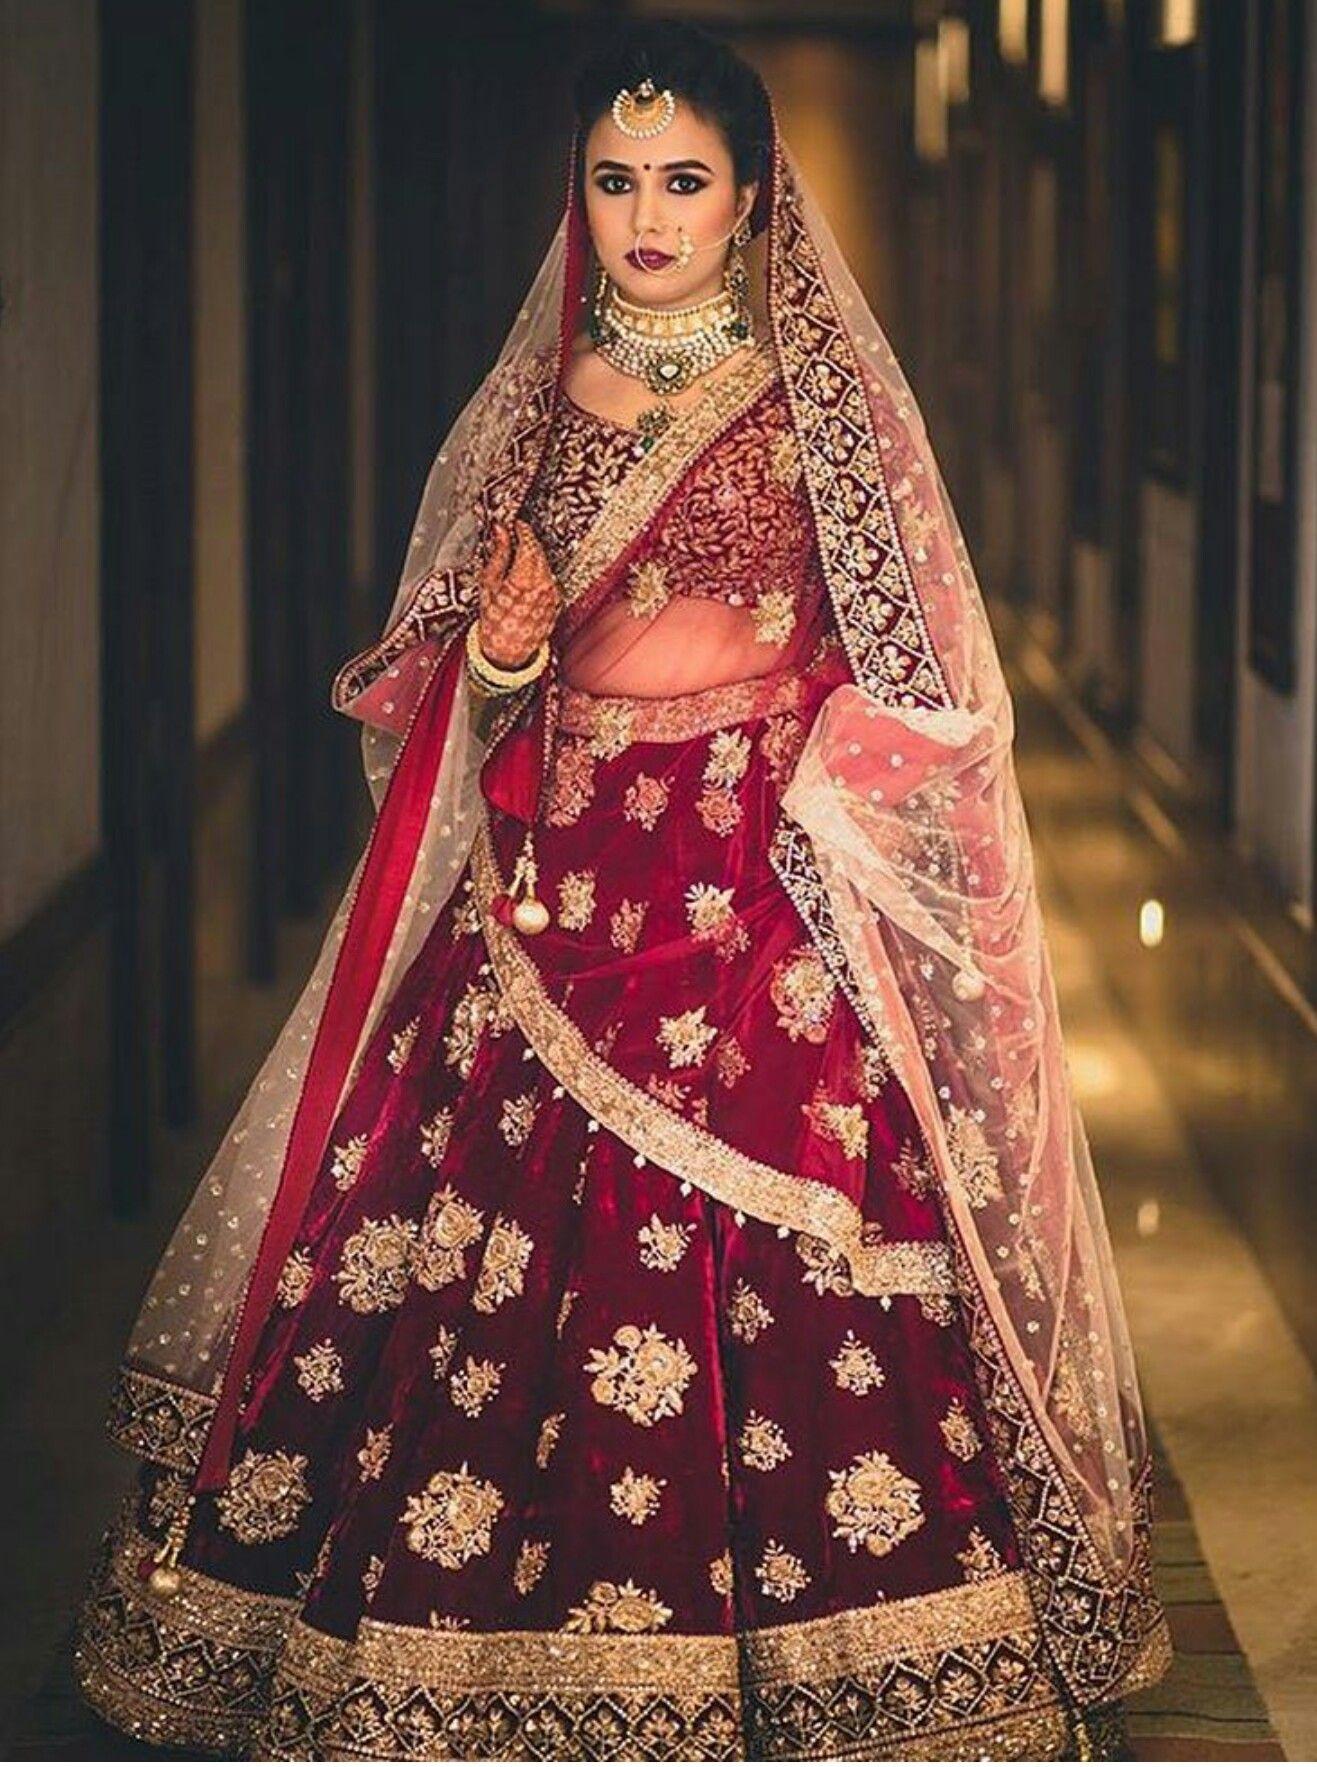 Wedding | fat burn | Pinterest | Wedding, Wedding and Indian outfits